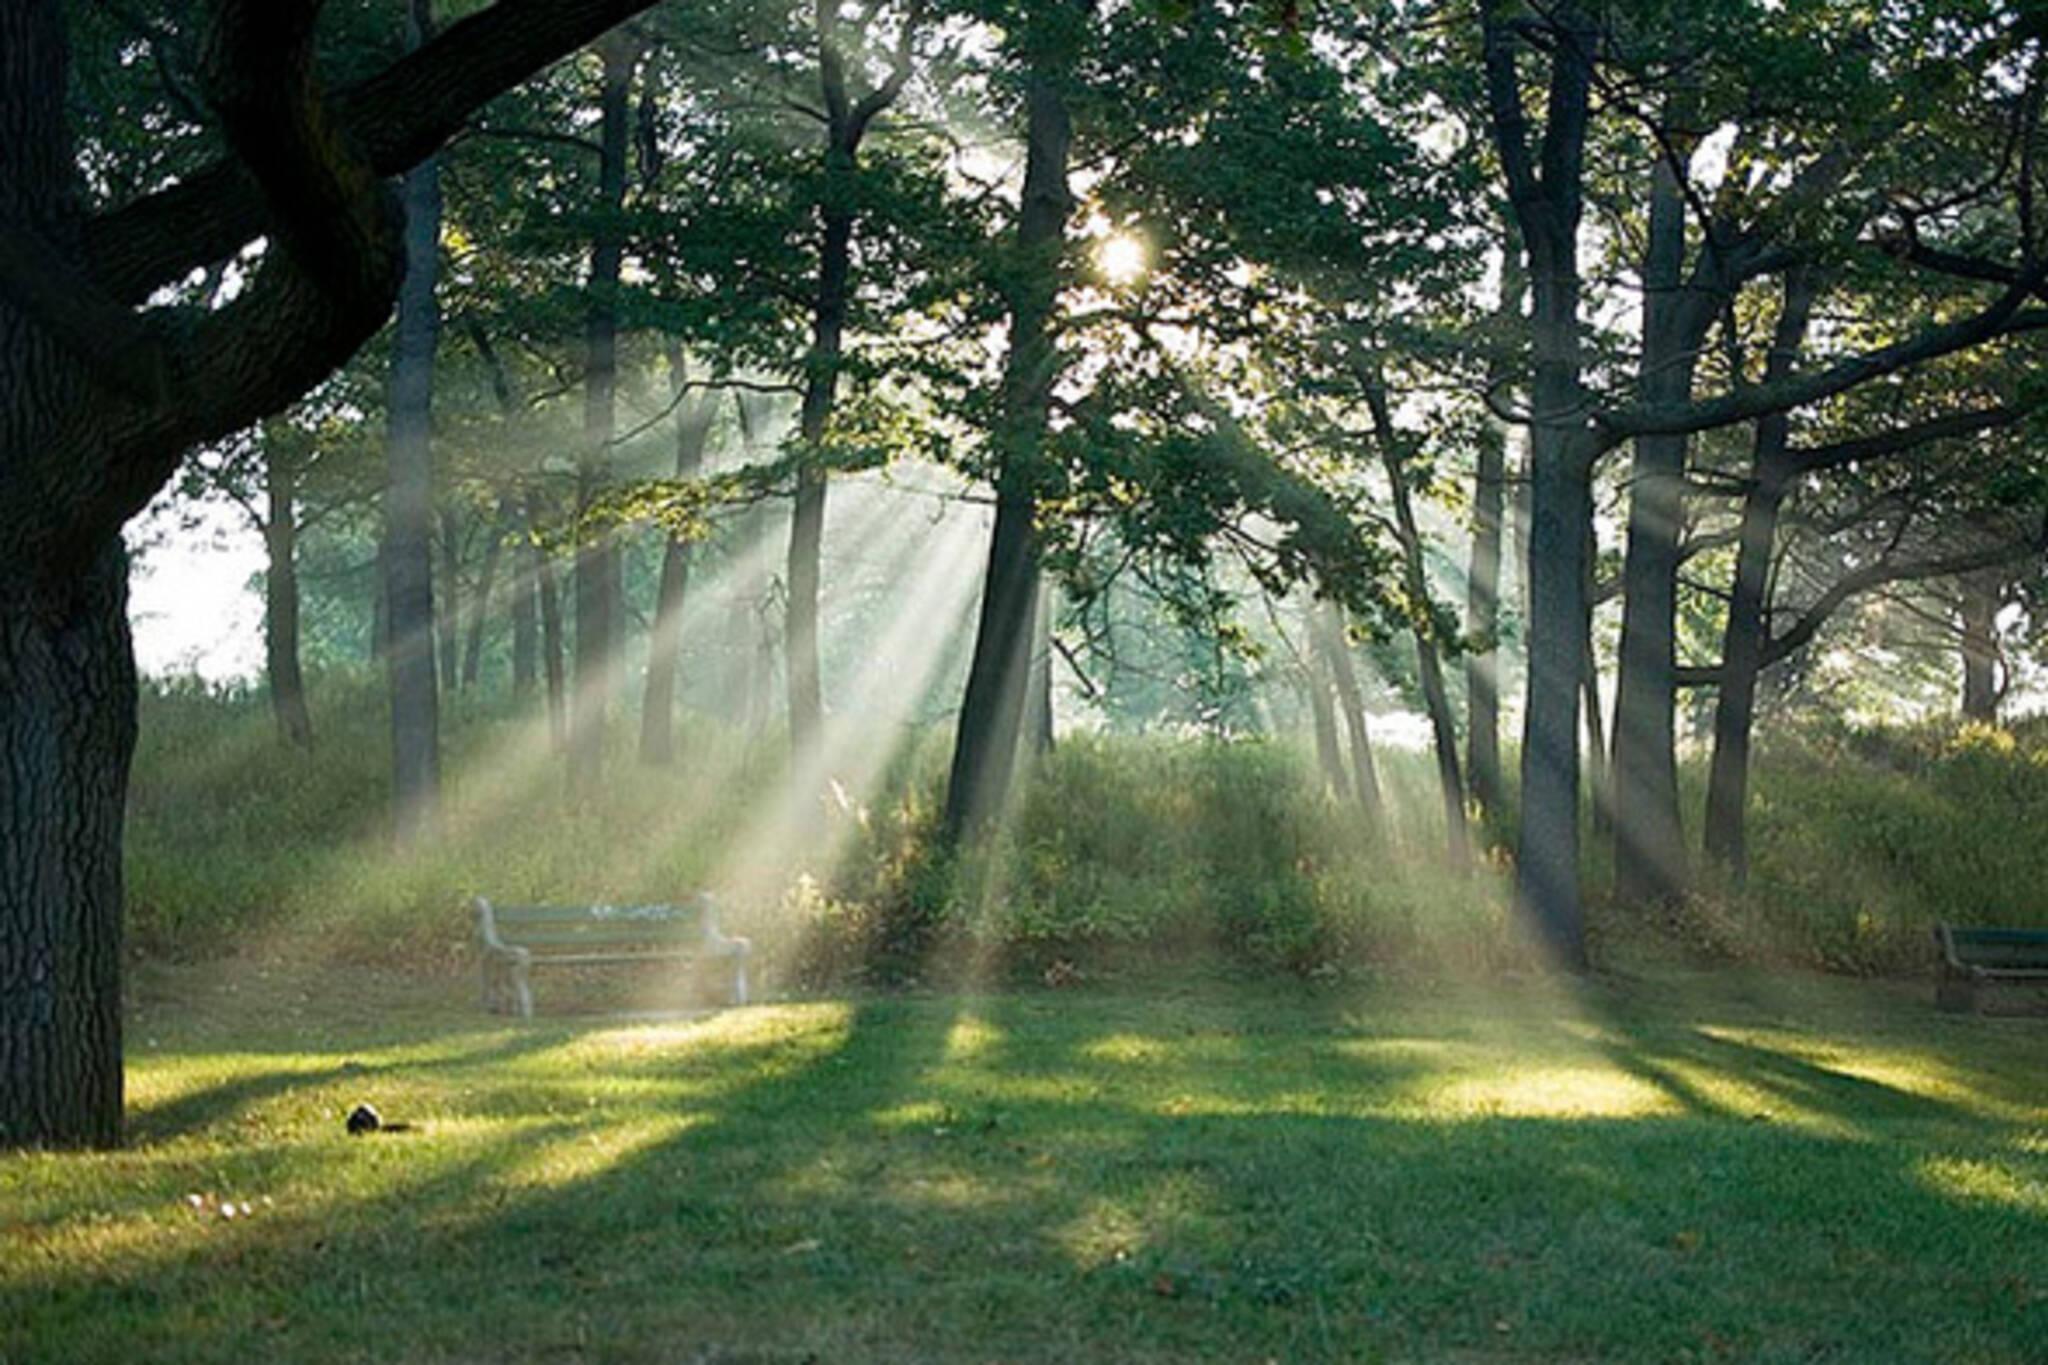 Toronto Parks Environment Core Services